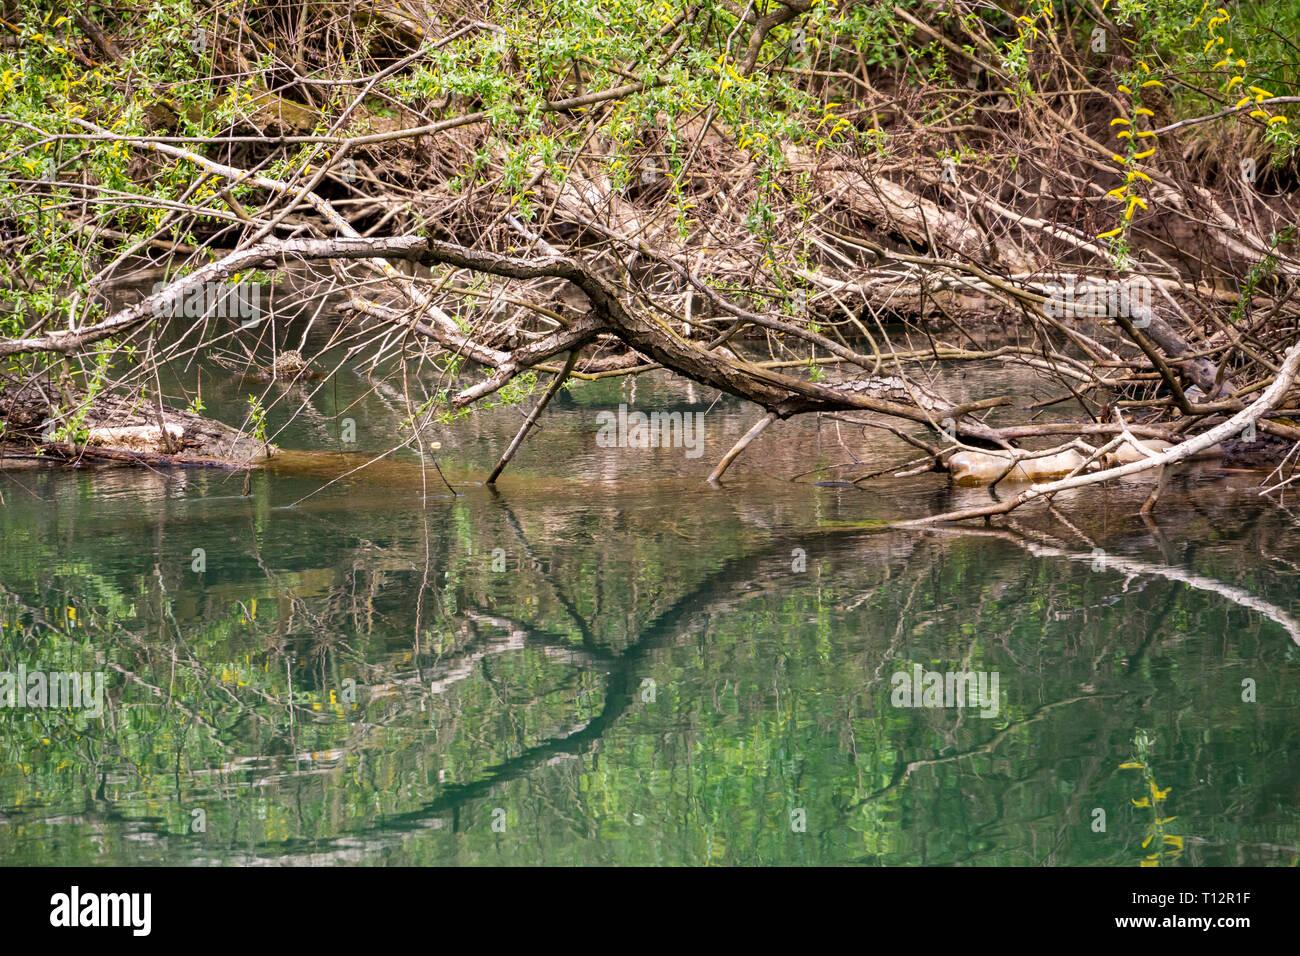 Dry branches reflections, fallen debris and plastic bottles, Zlatna Panega River surface at Iskar-Panega Eco-path Geopark, the first geopark in Bulgar - Stock Image